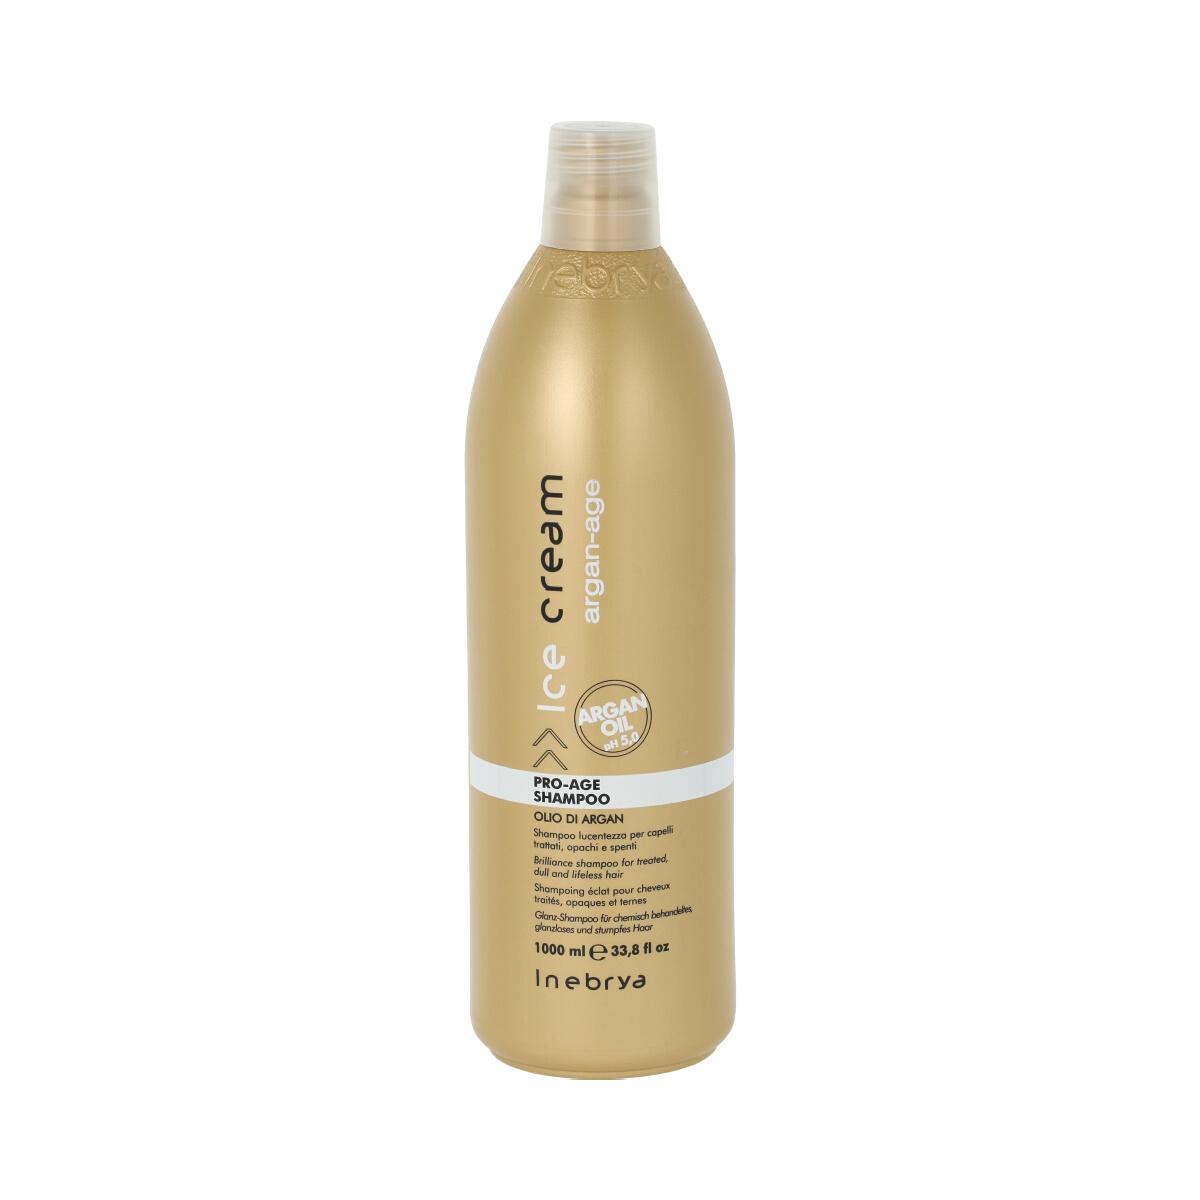 Inebrya Argan-Age Shampoo 1 000 ml 94093